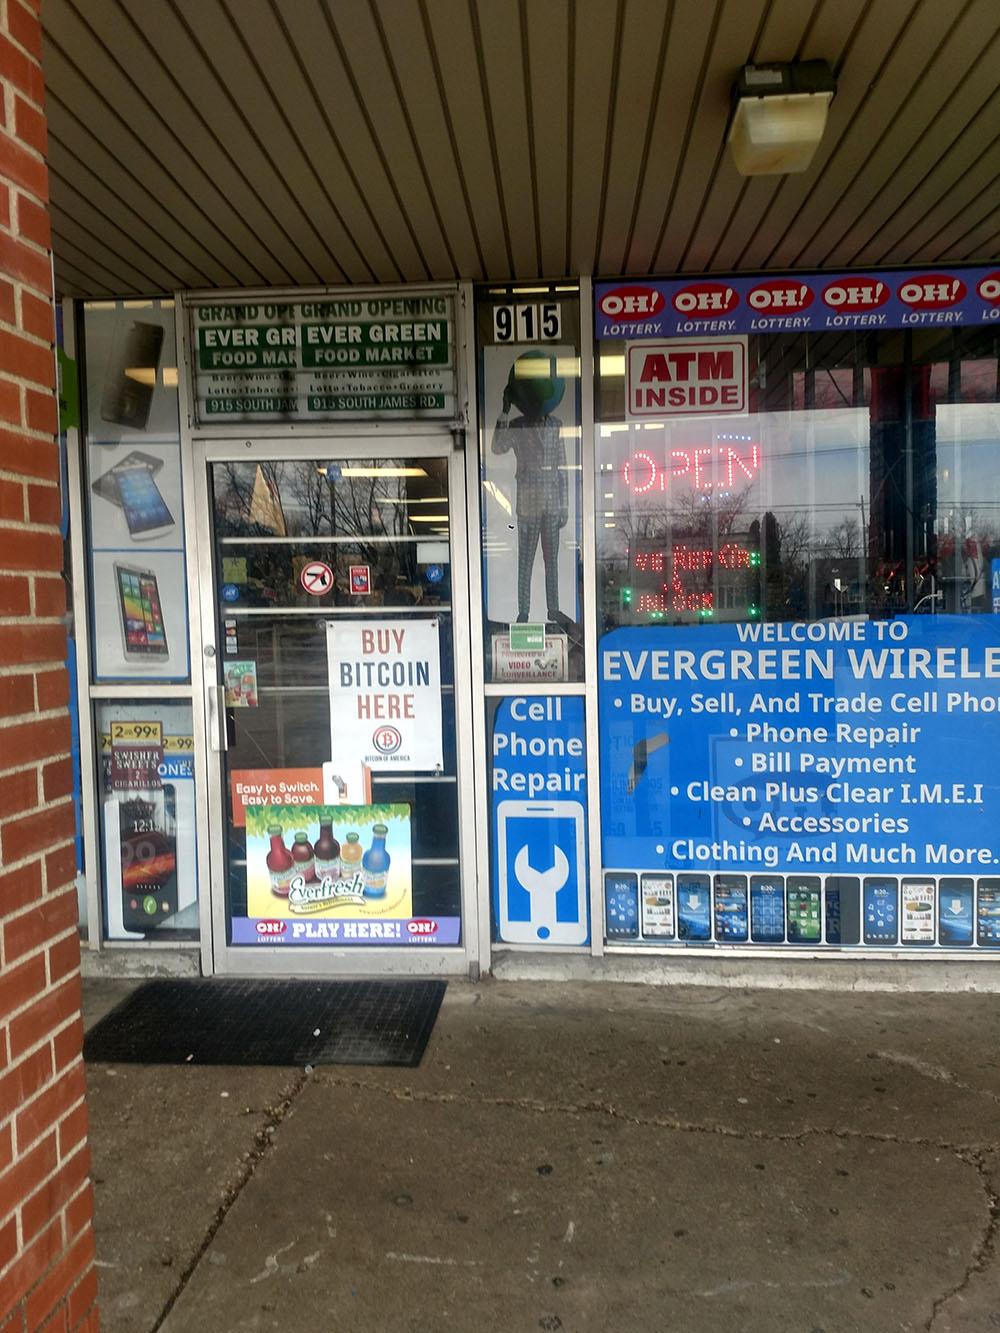 Evergreen Food Market